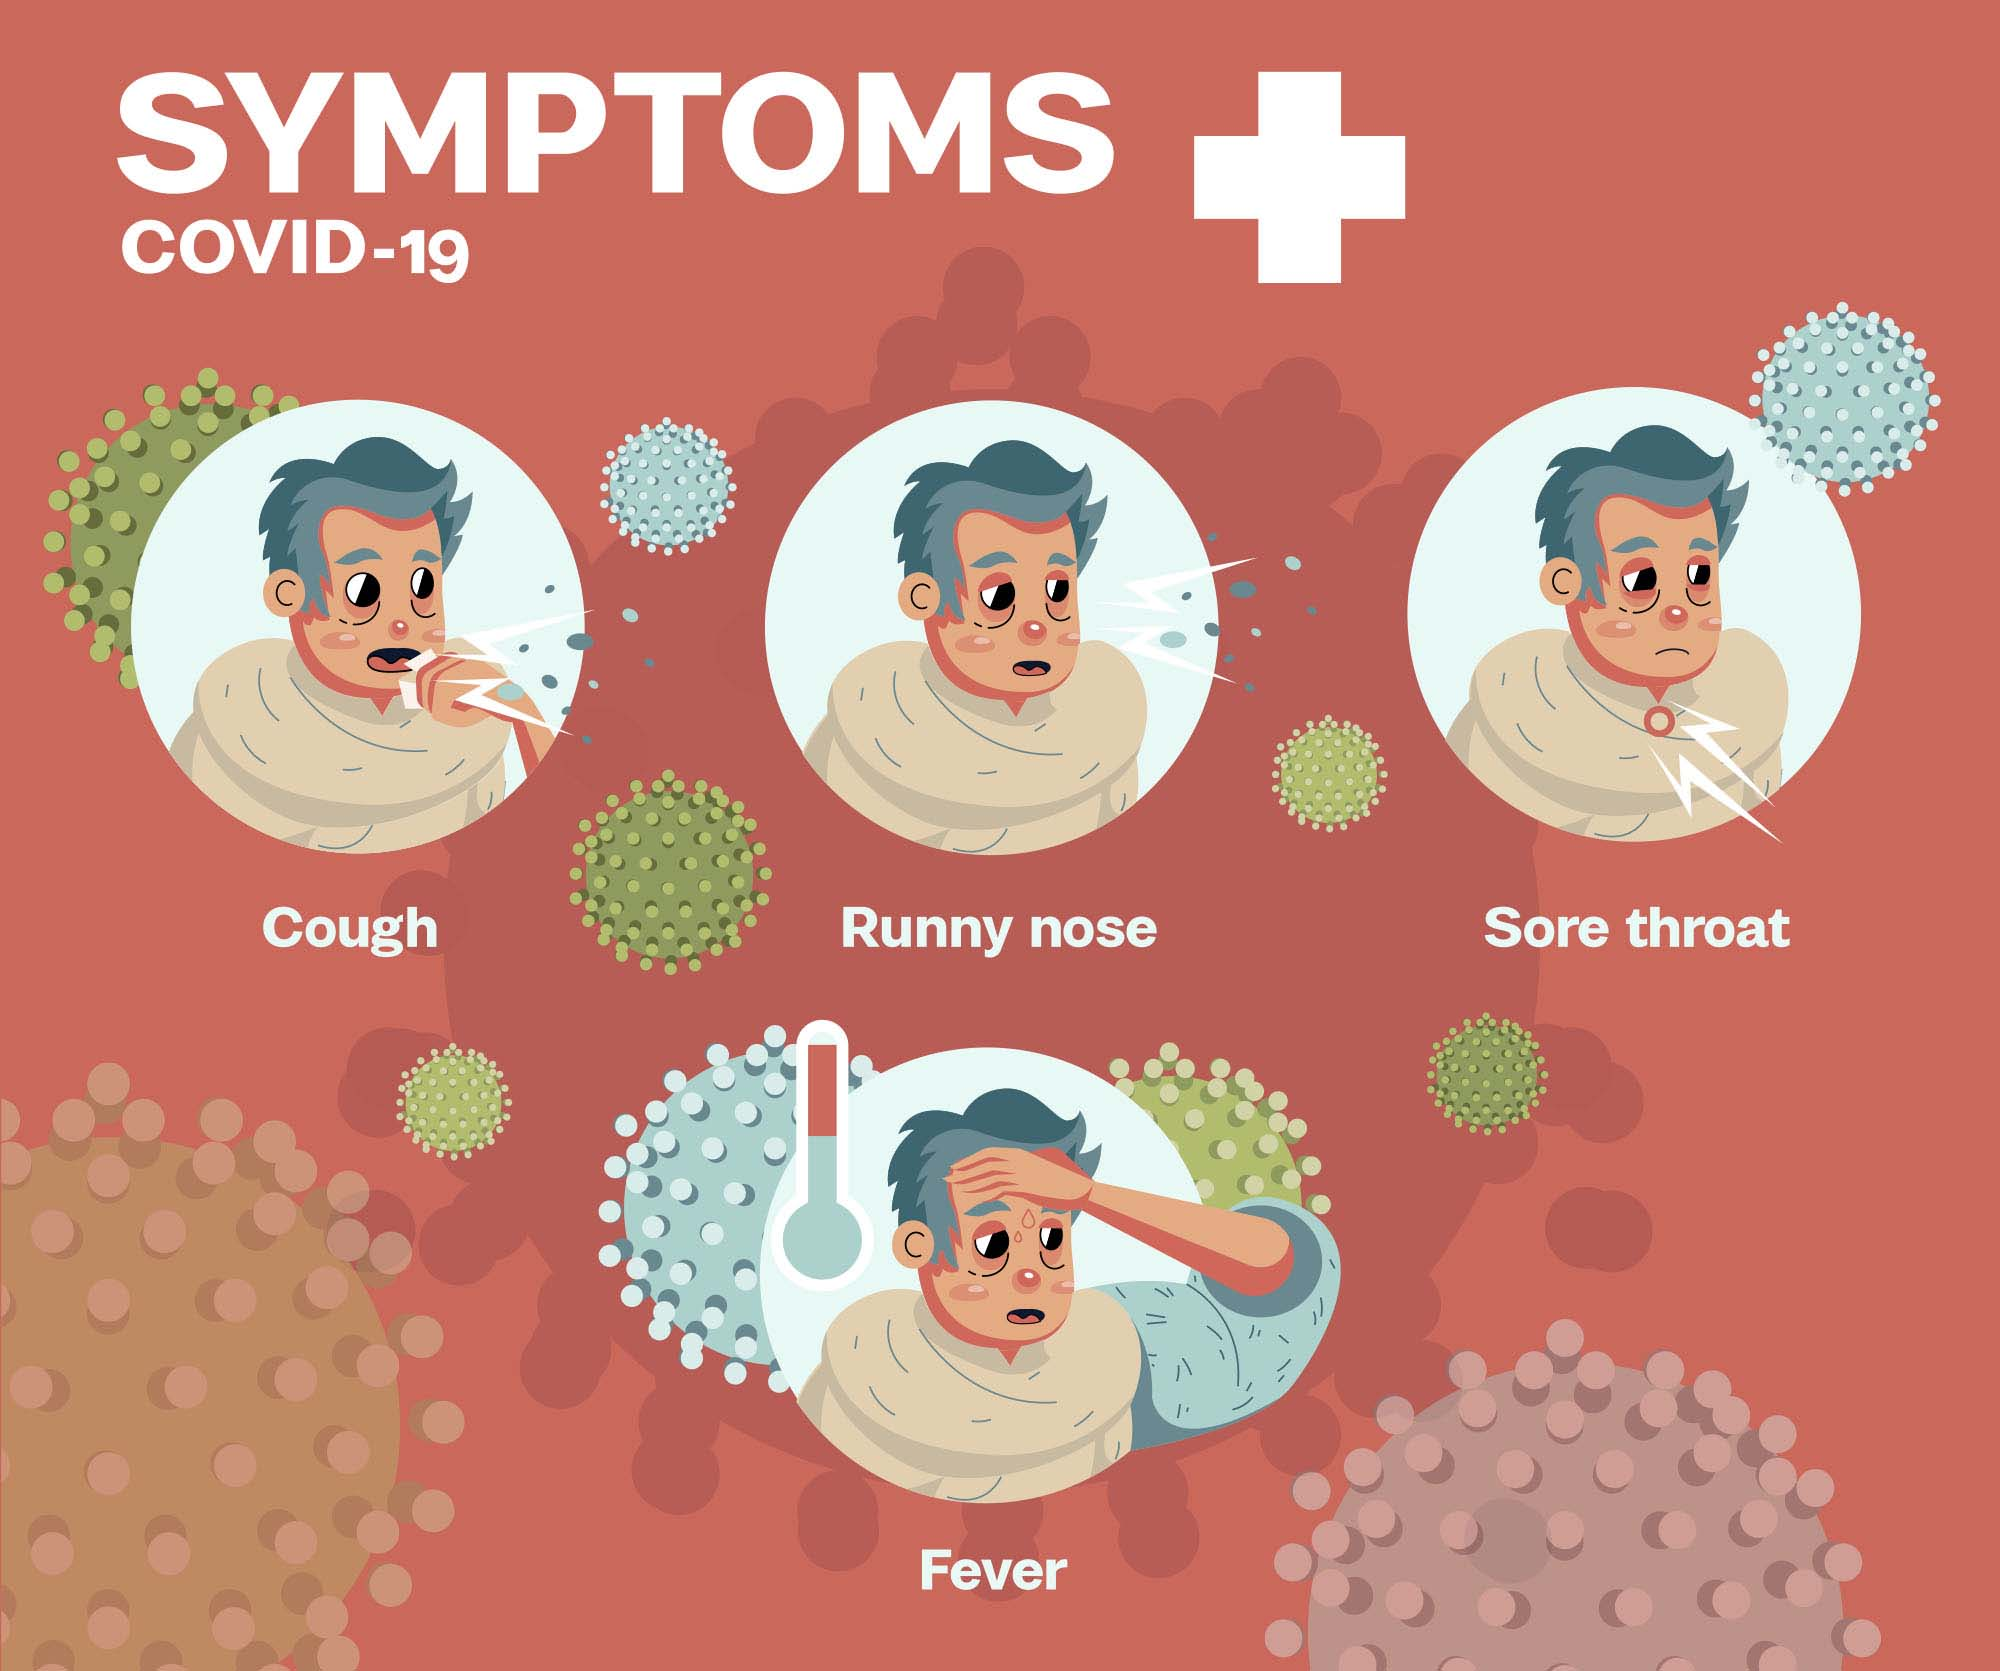 Covid 19 Symptoms Illustration